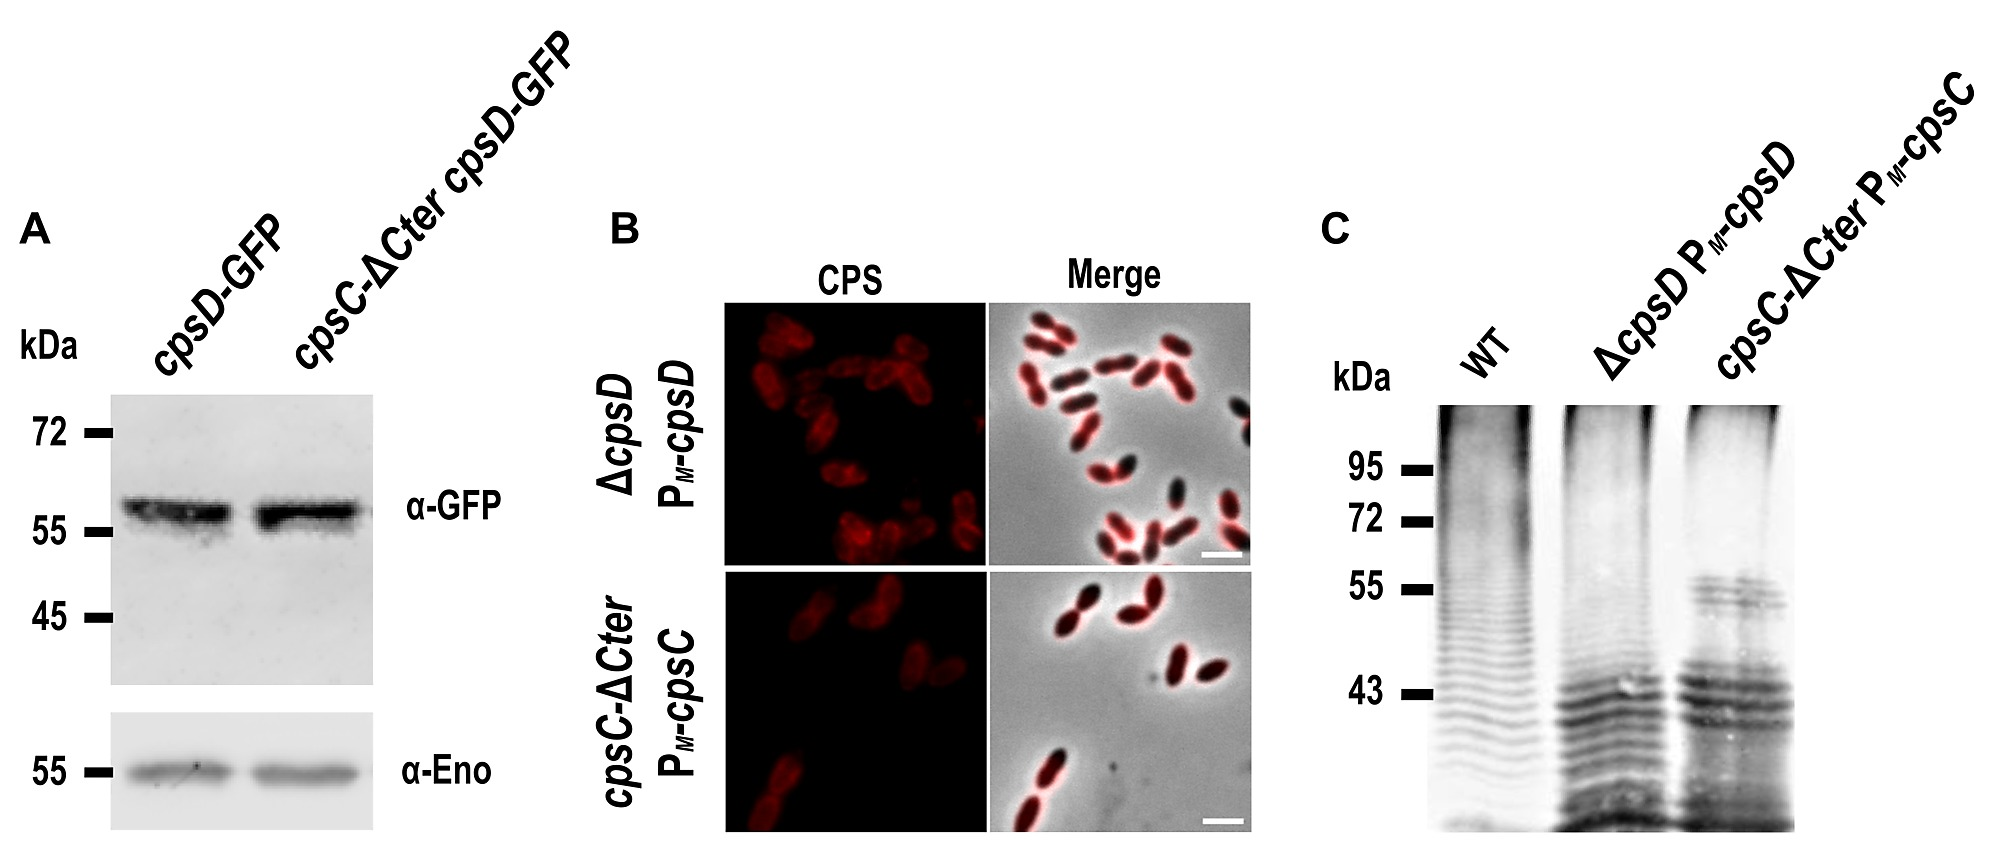 Autophosphorylation of the Bacterial Tyrosine-Kinase CpsD